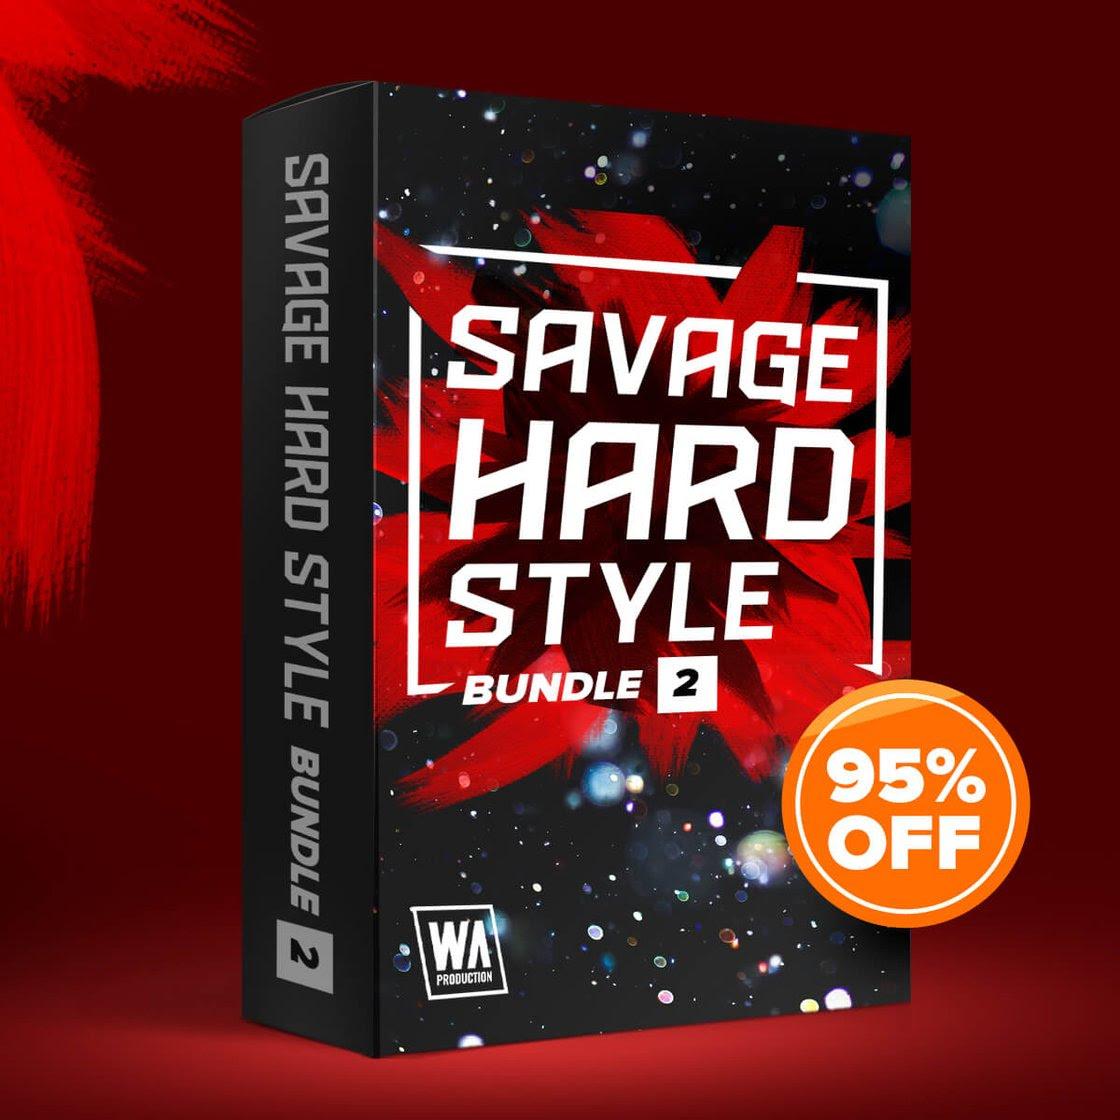 W. A. Savage Hardstyle Bundle 2 Discount Sale